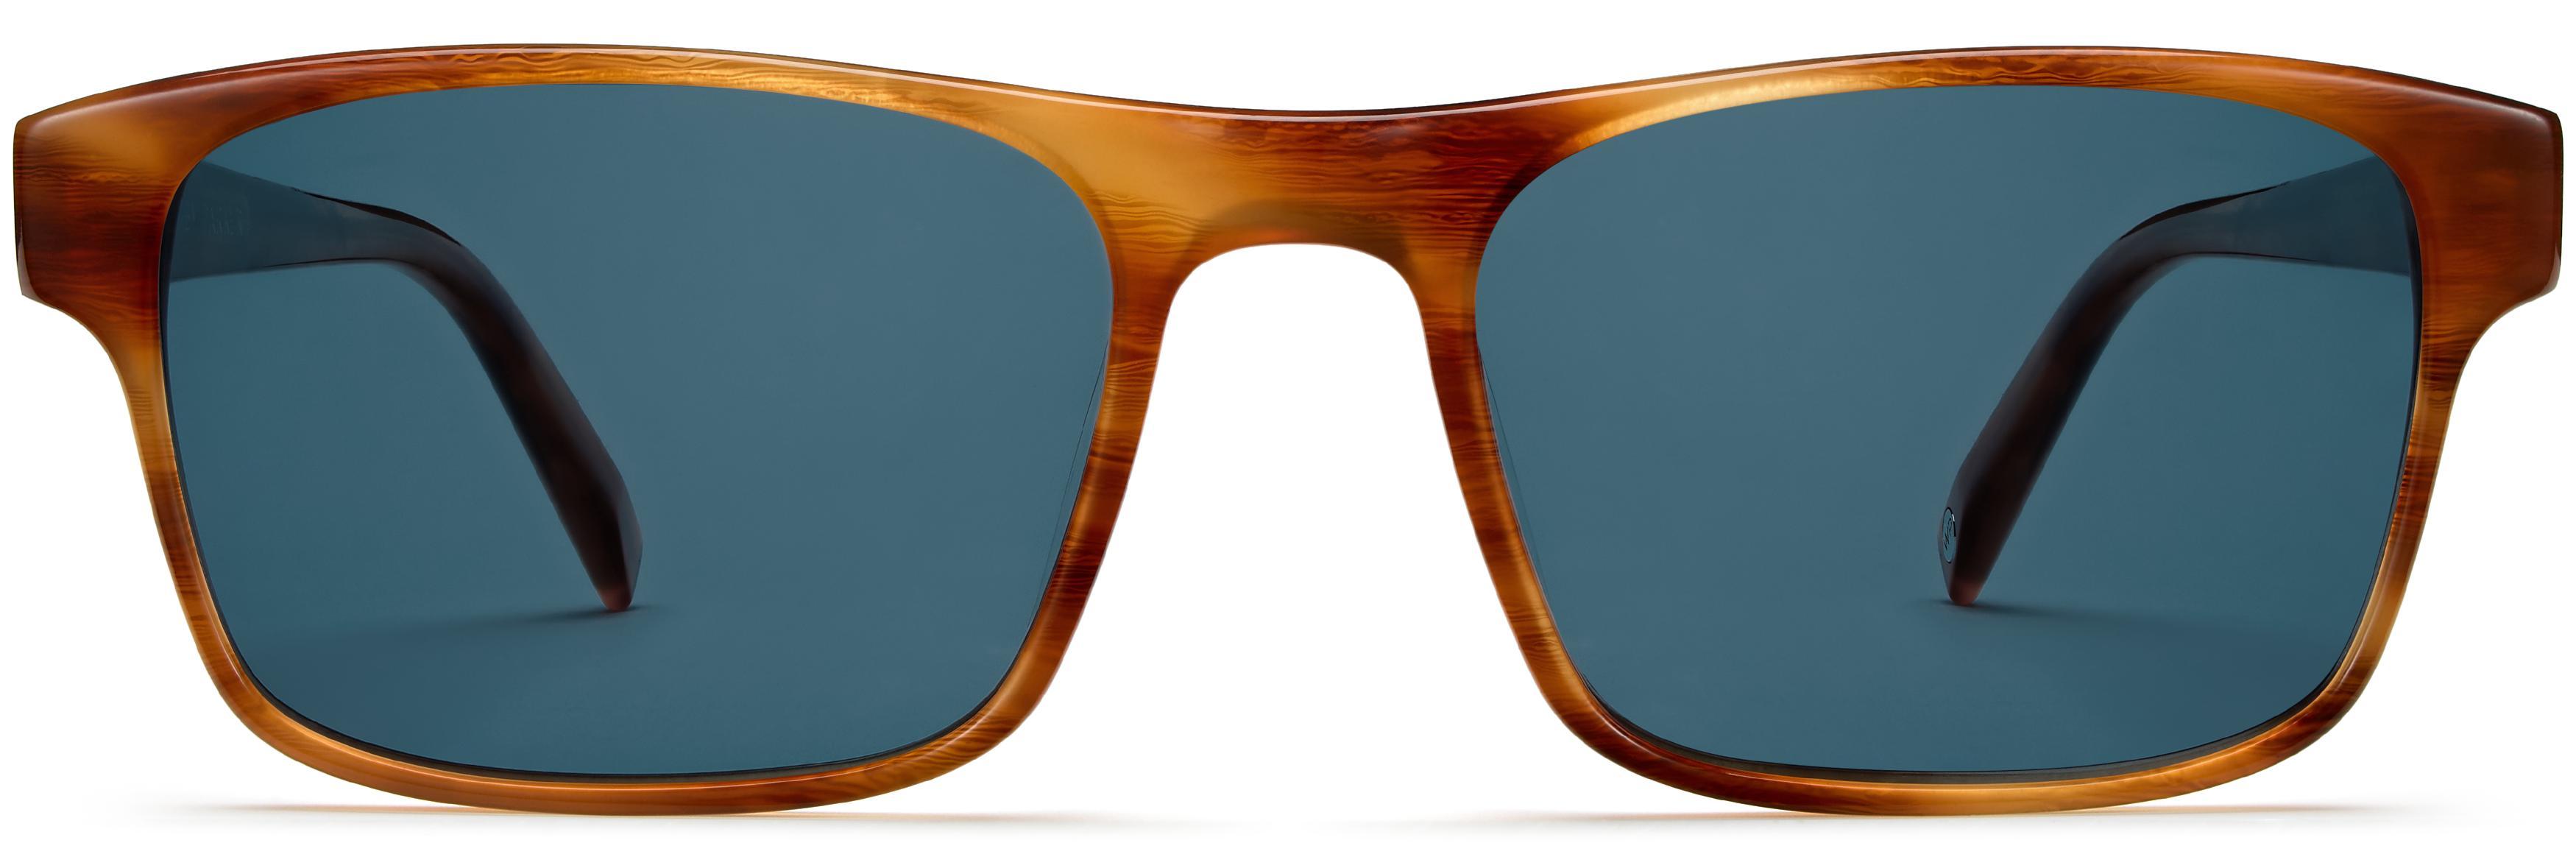 ce82471b6ec Women s Sunglasses